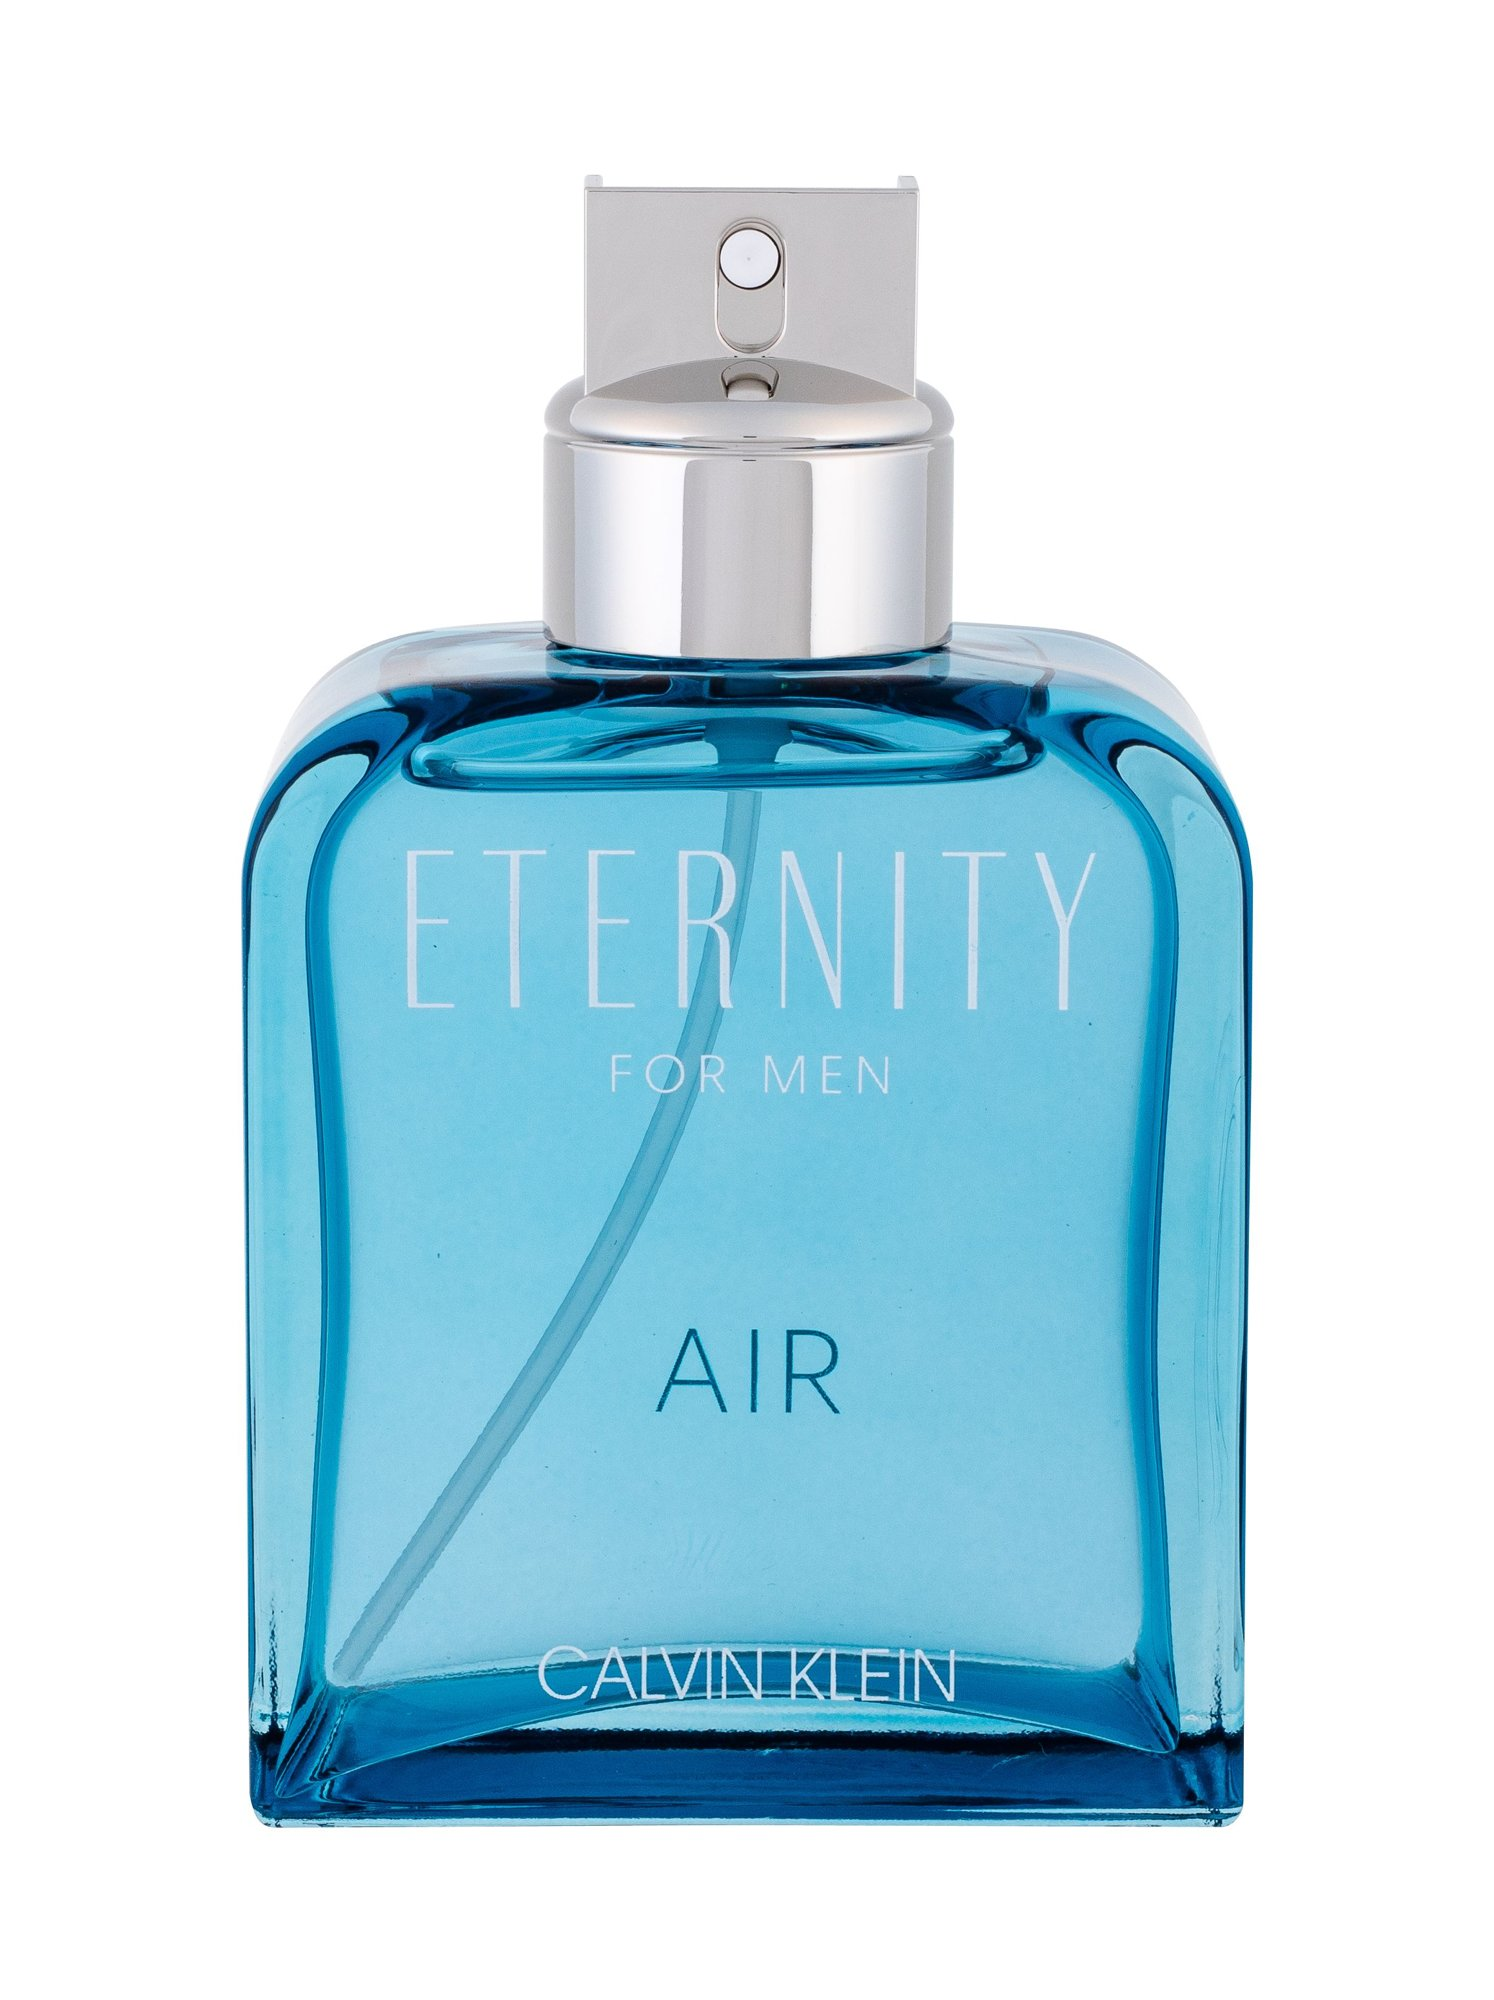 Calvin Klein Eternity Eau de Toilette 200ml